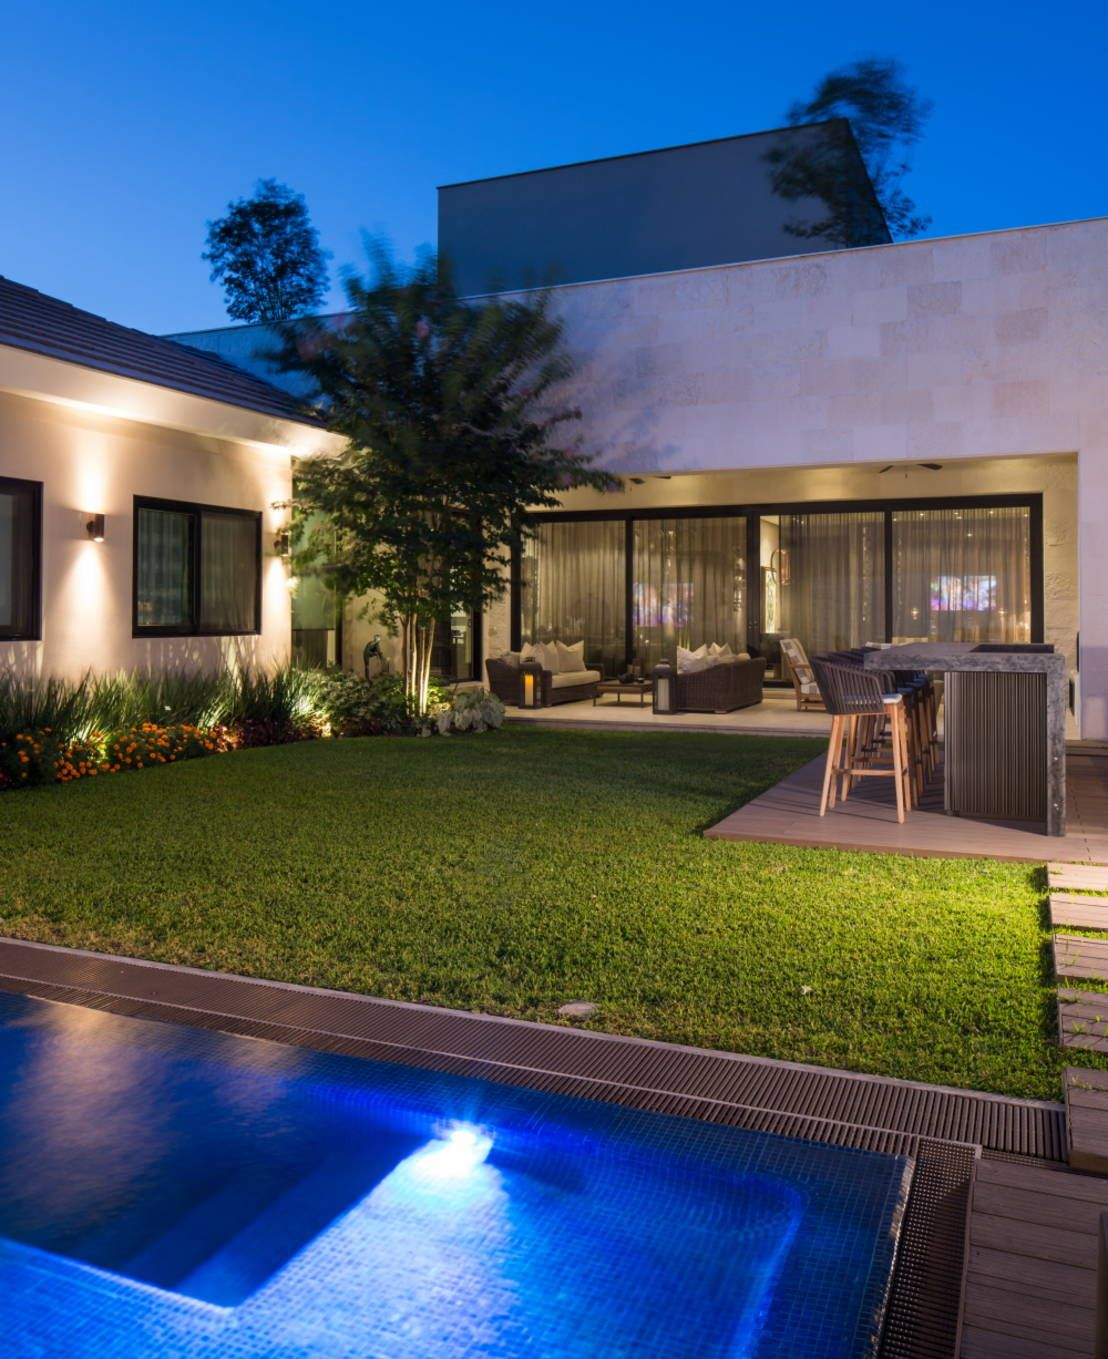 Casa Miguel Ngel De Rousseau Arquitectos Patios House And Garden # Muebles Moedano